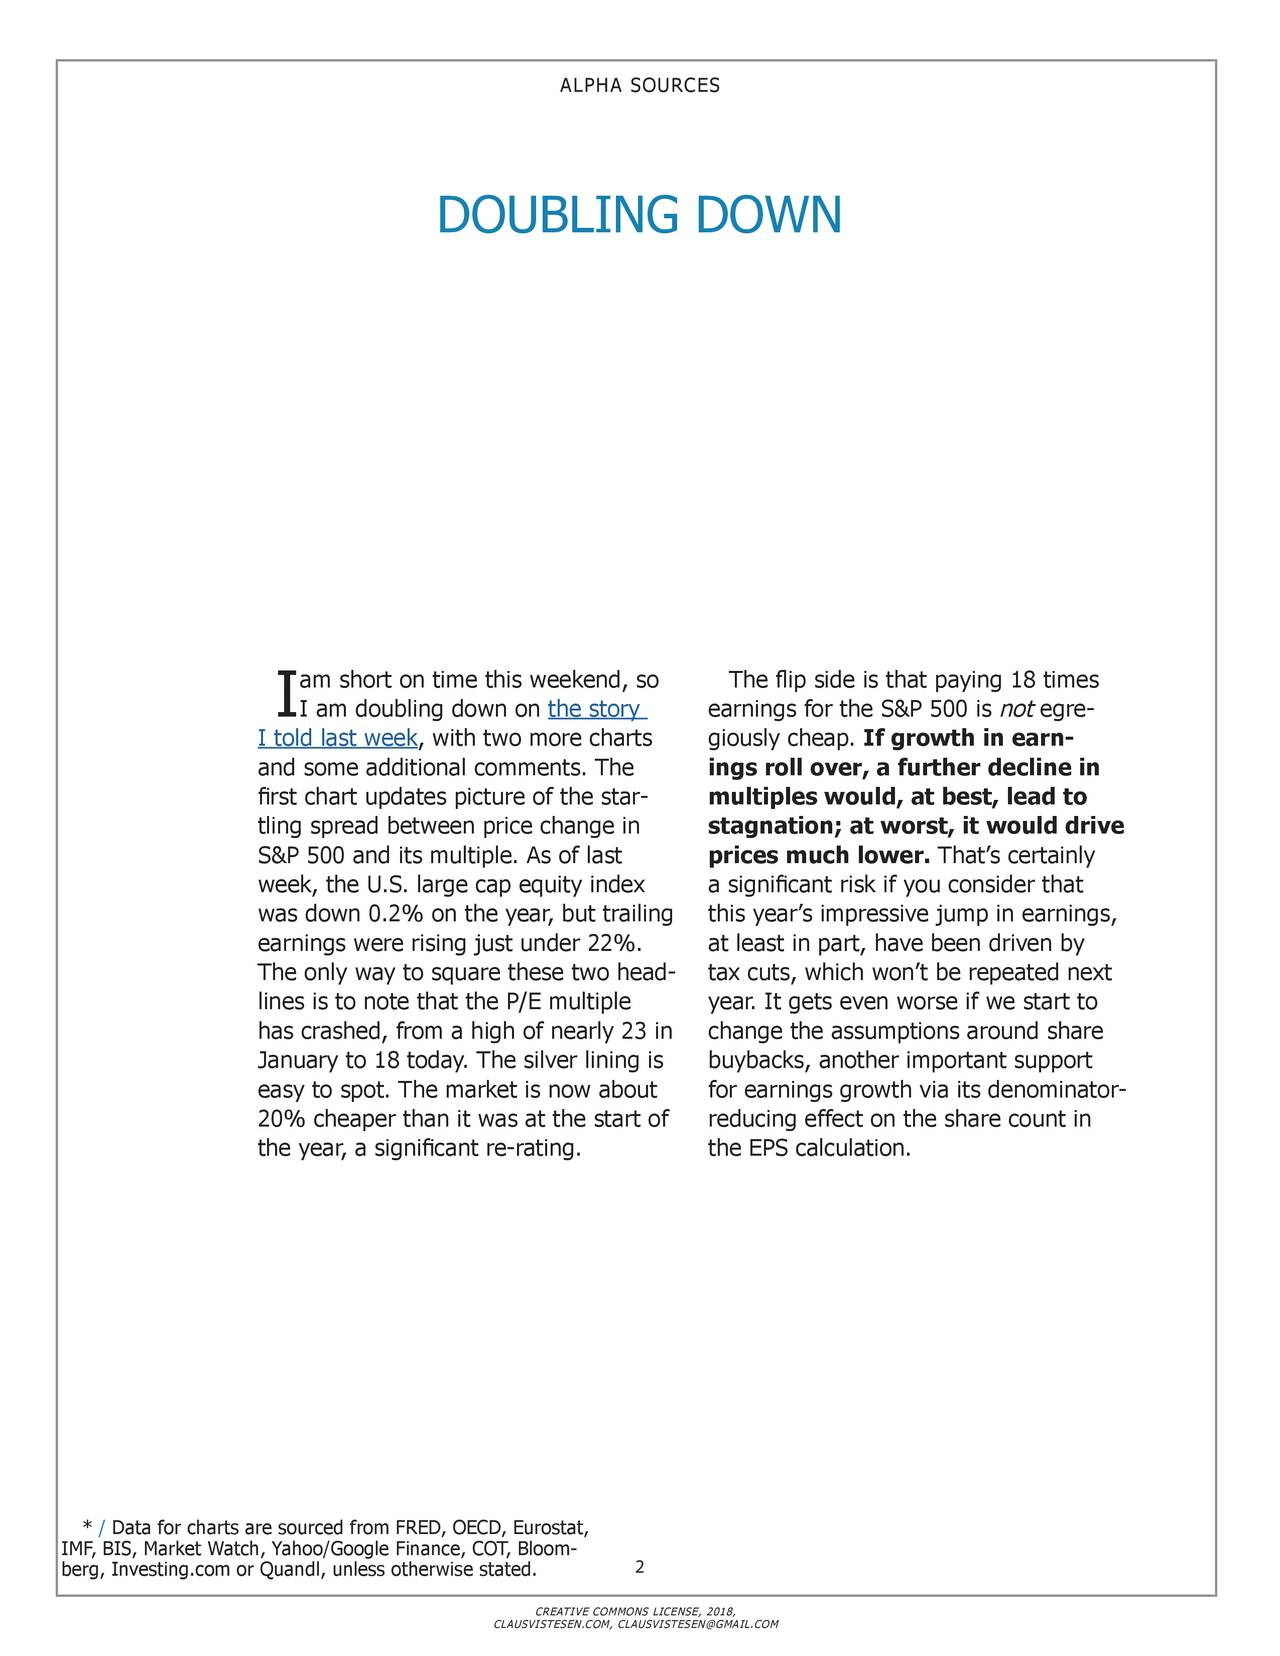 doubling down seeking alpha. Black Bedroom Furniture Sets. Home Design Ideas